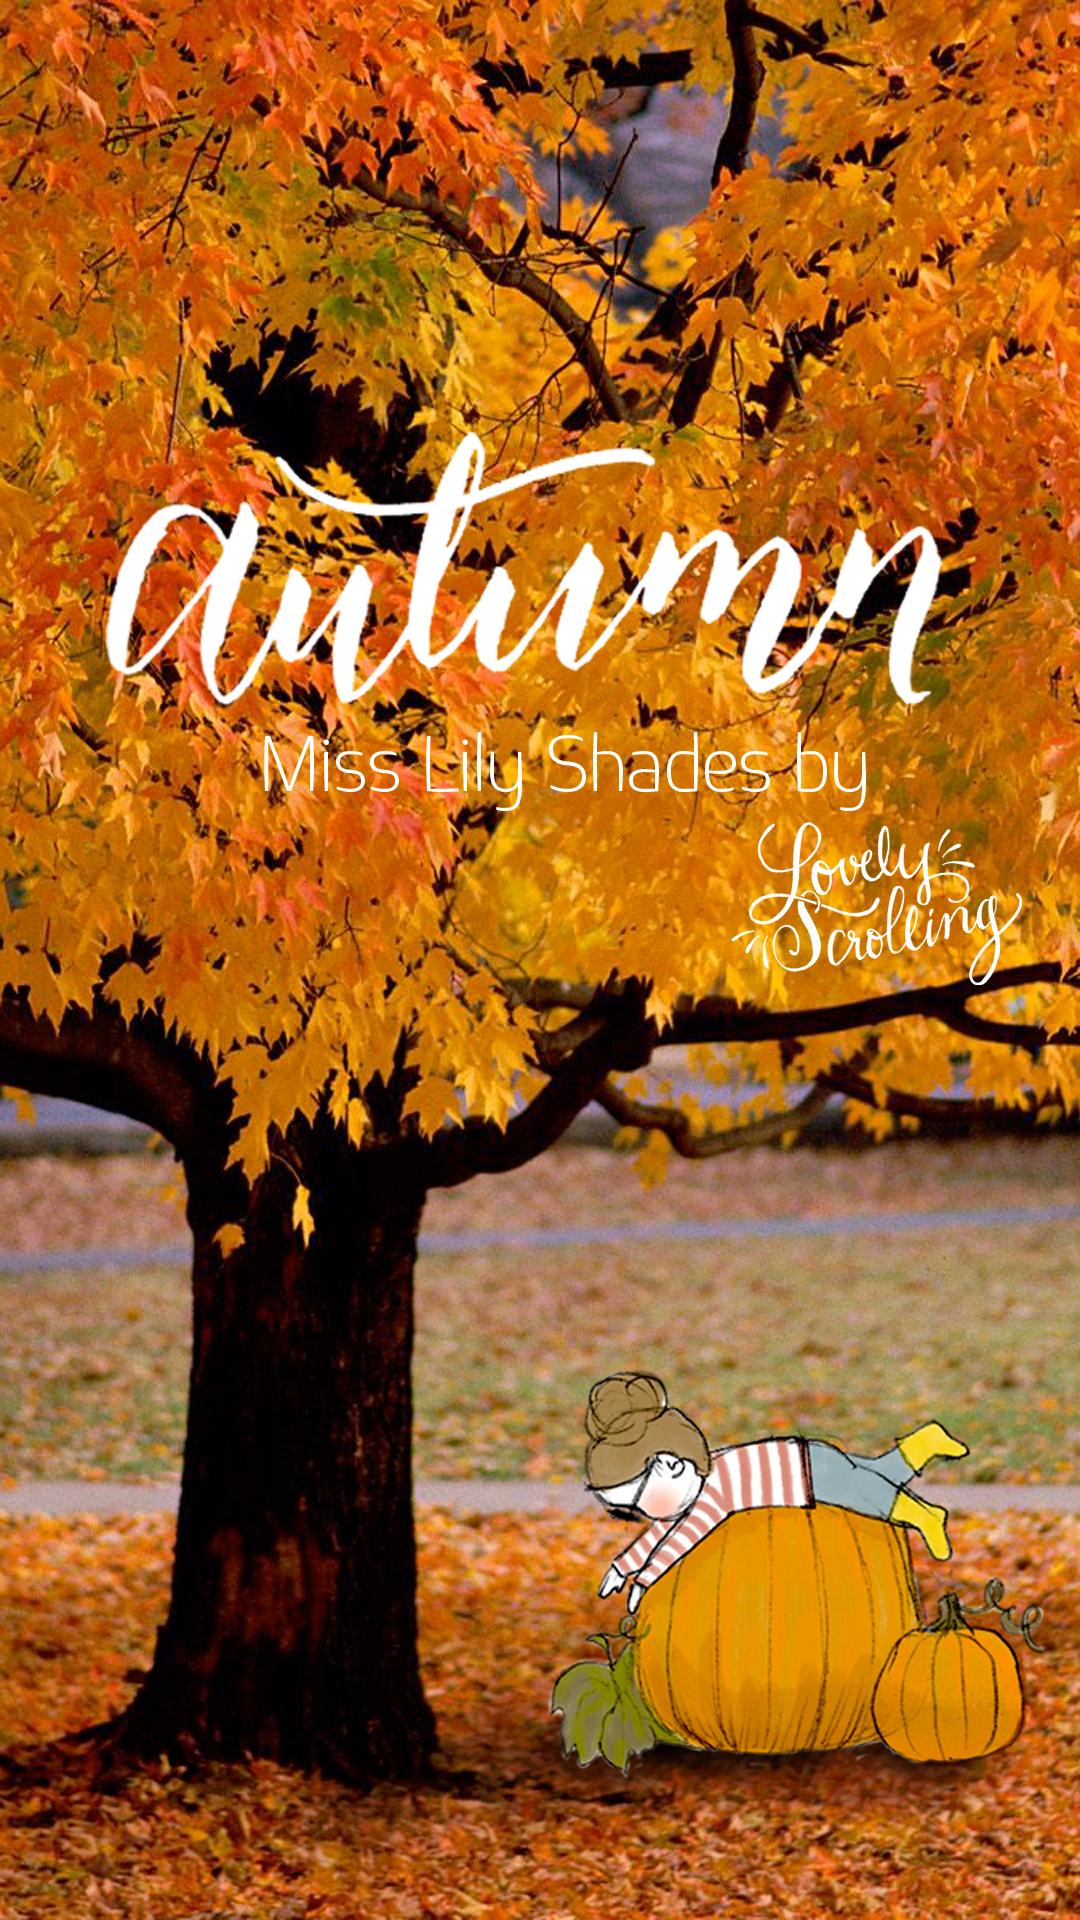 Kate Spade Desktop Wallpaper Fall Miss Lily Shades Autumn Set Lovely Scrolling